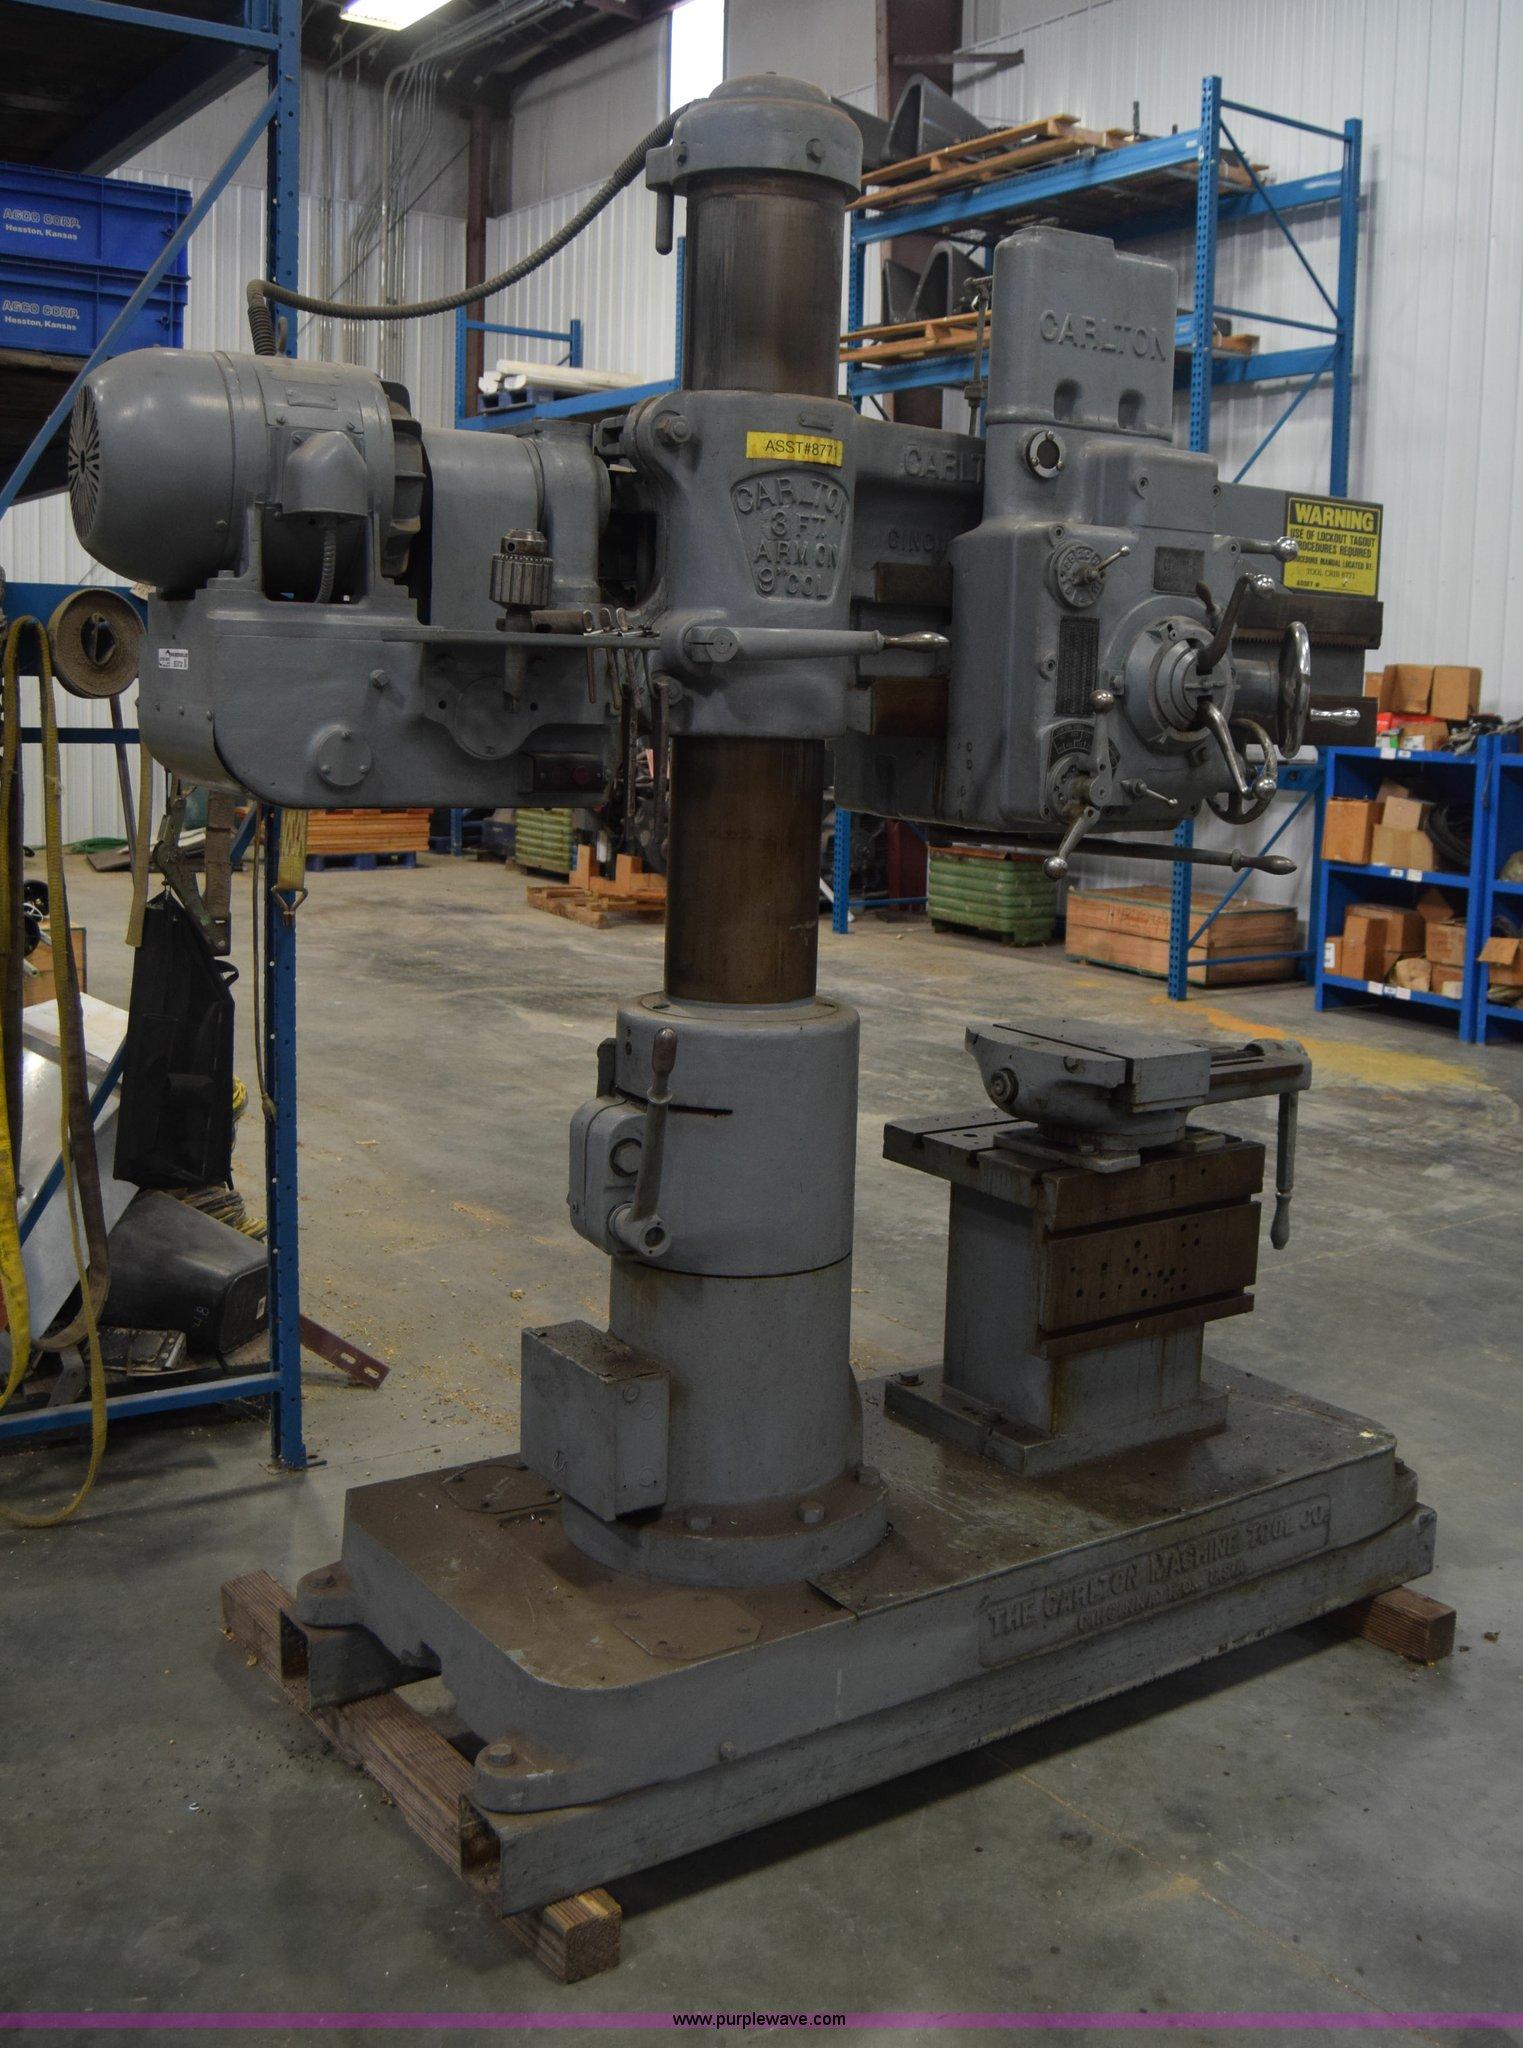 Carlton Radial Arm Drill